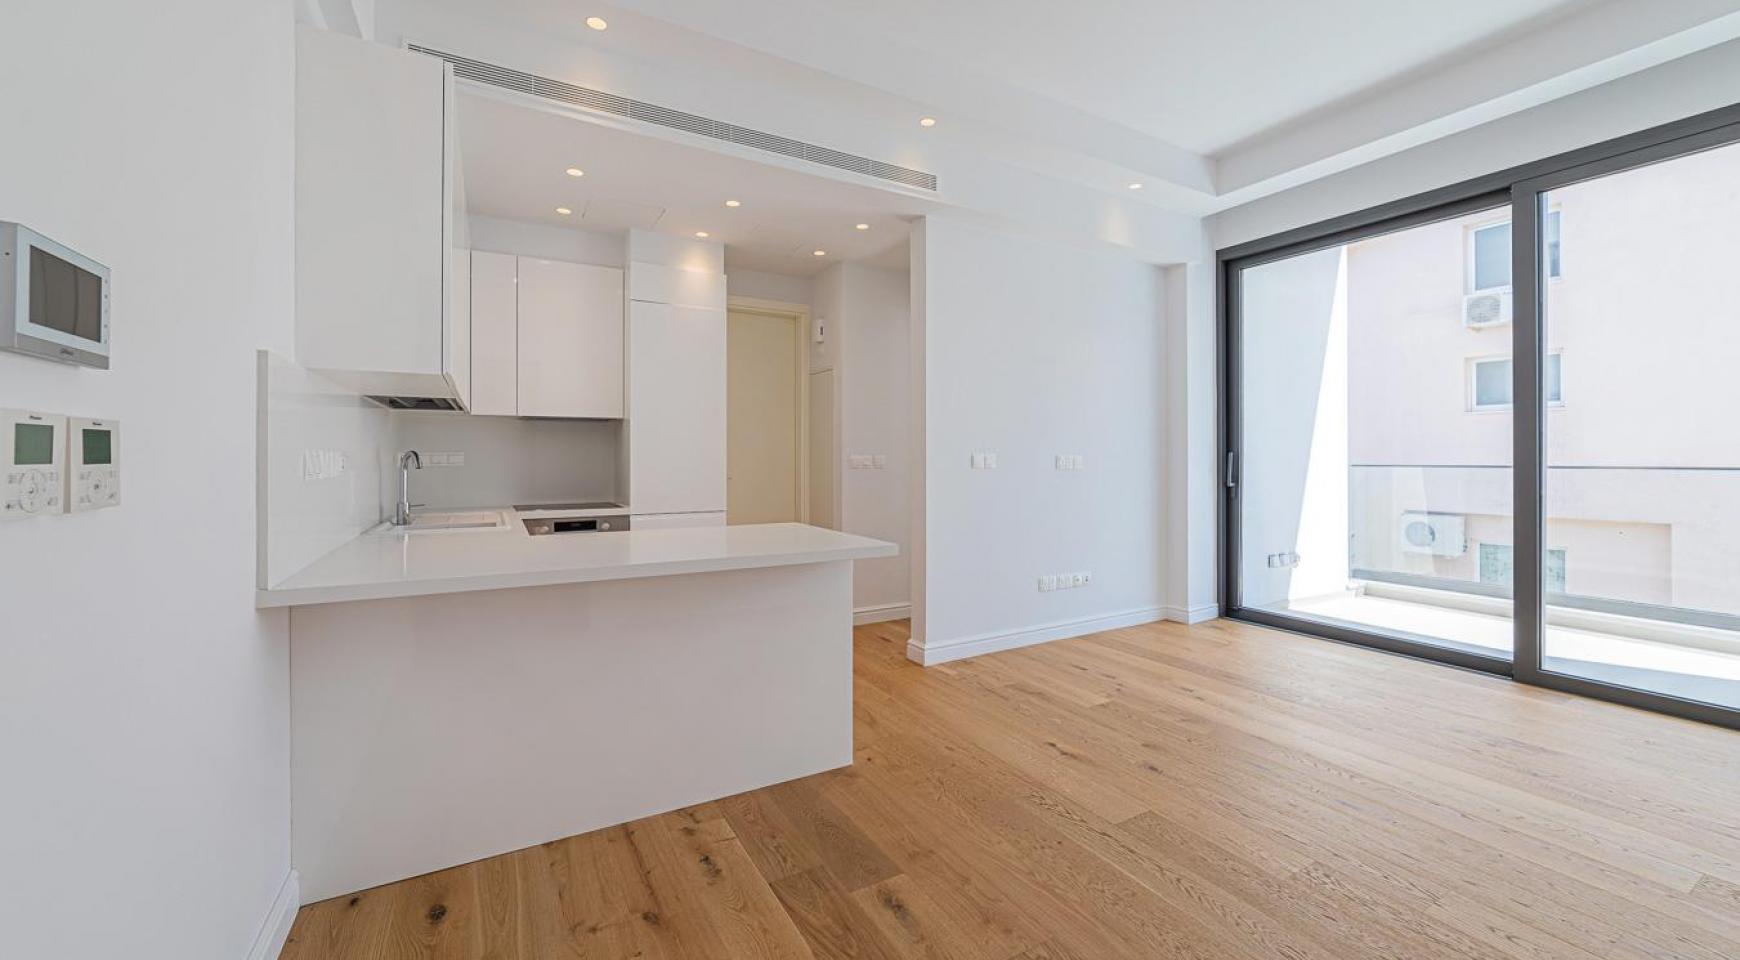 Malibu Residence. Modern One Bedroom Apartment 101 in Potamos Germasogeia - 23